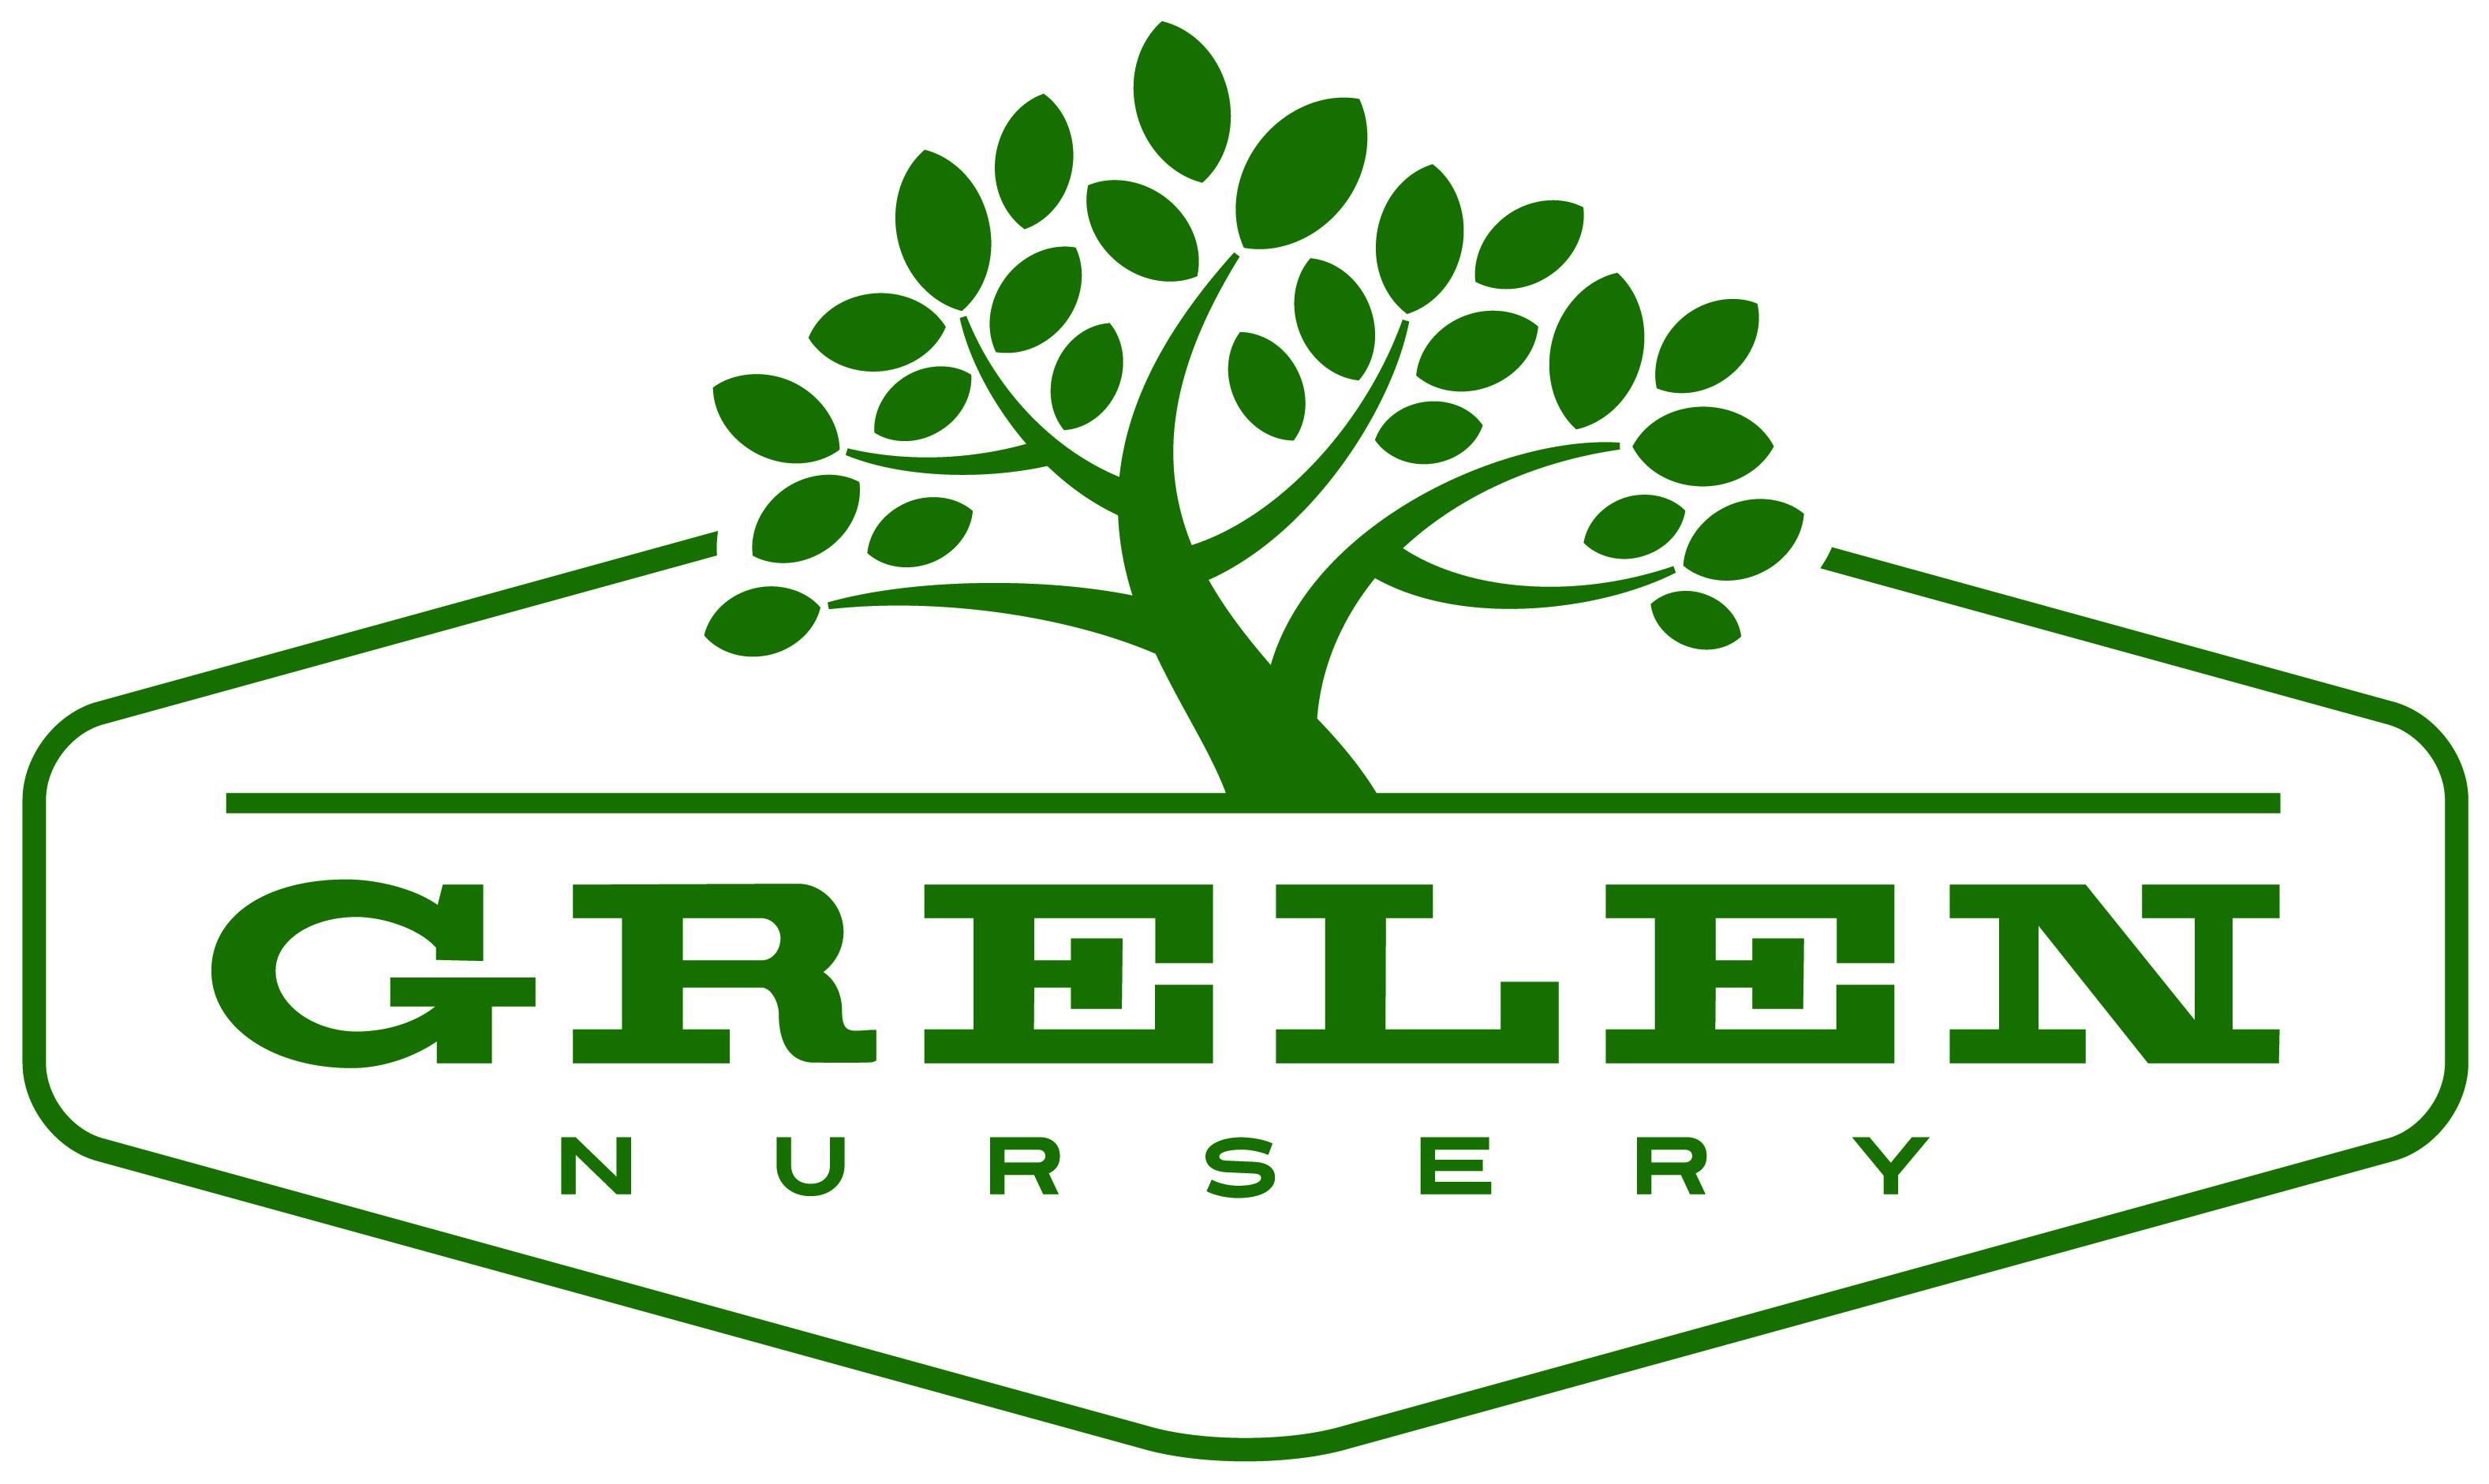 Grelen-Nursery-logo.jpg